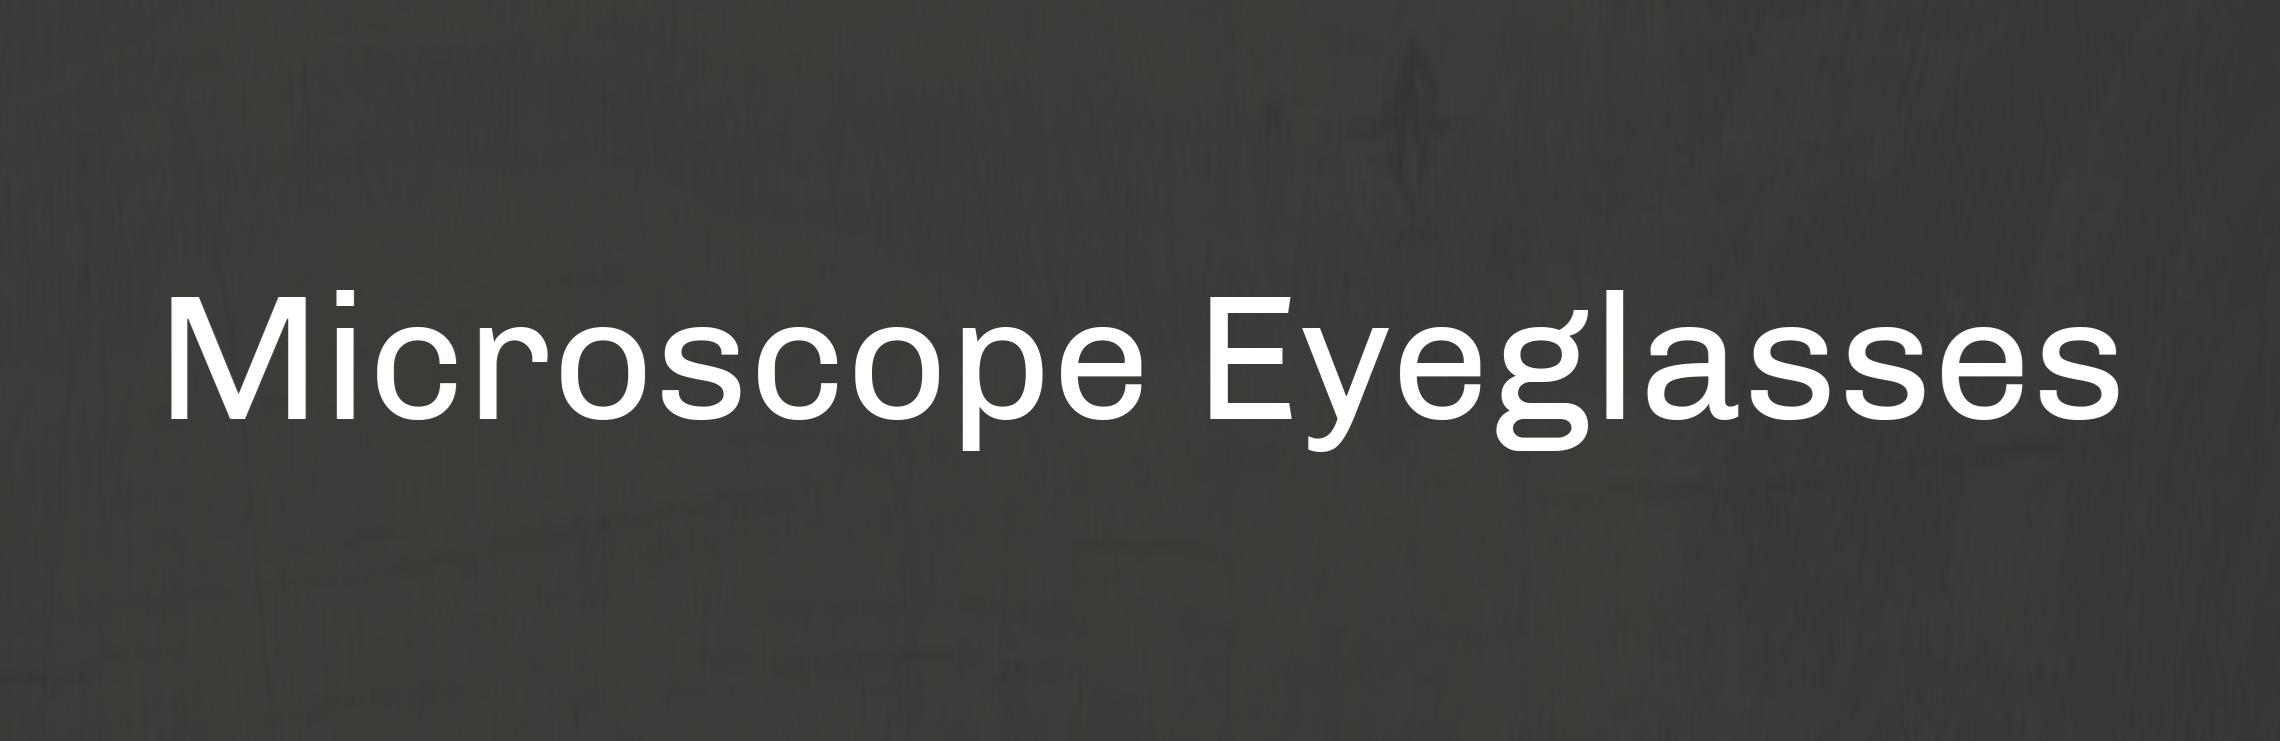 Microscope Eyeglasses